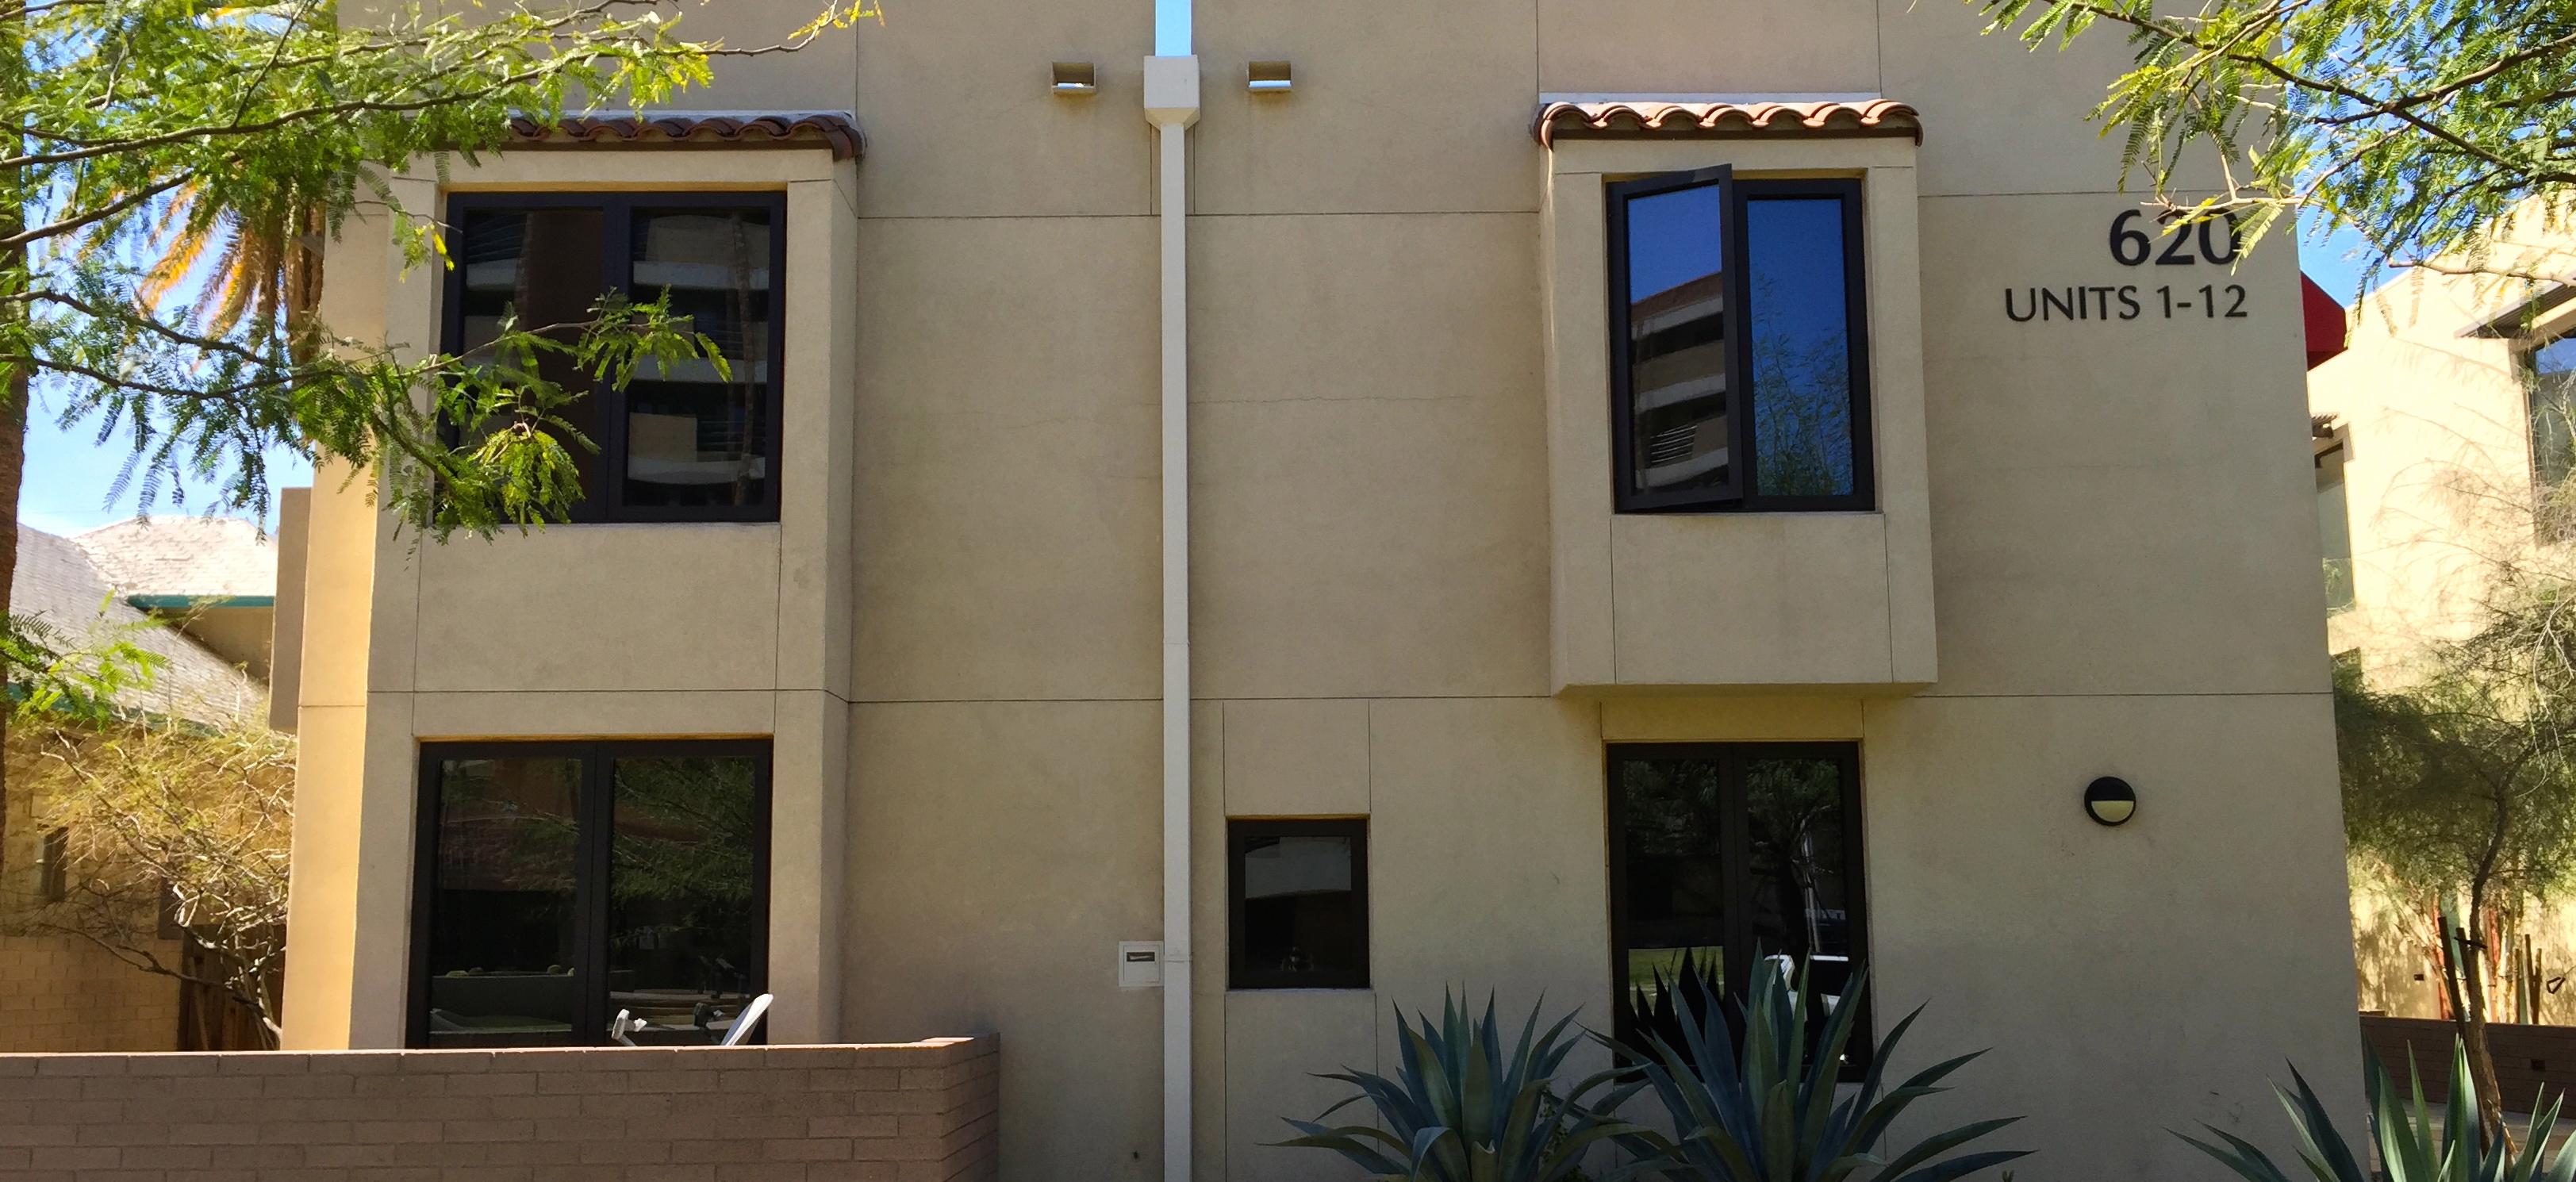 Vestis Group | Phoenix Multifamily Brokerage | Apartment Investment | Residential Development